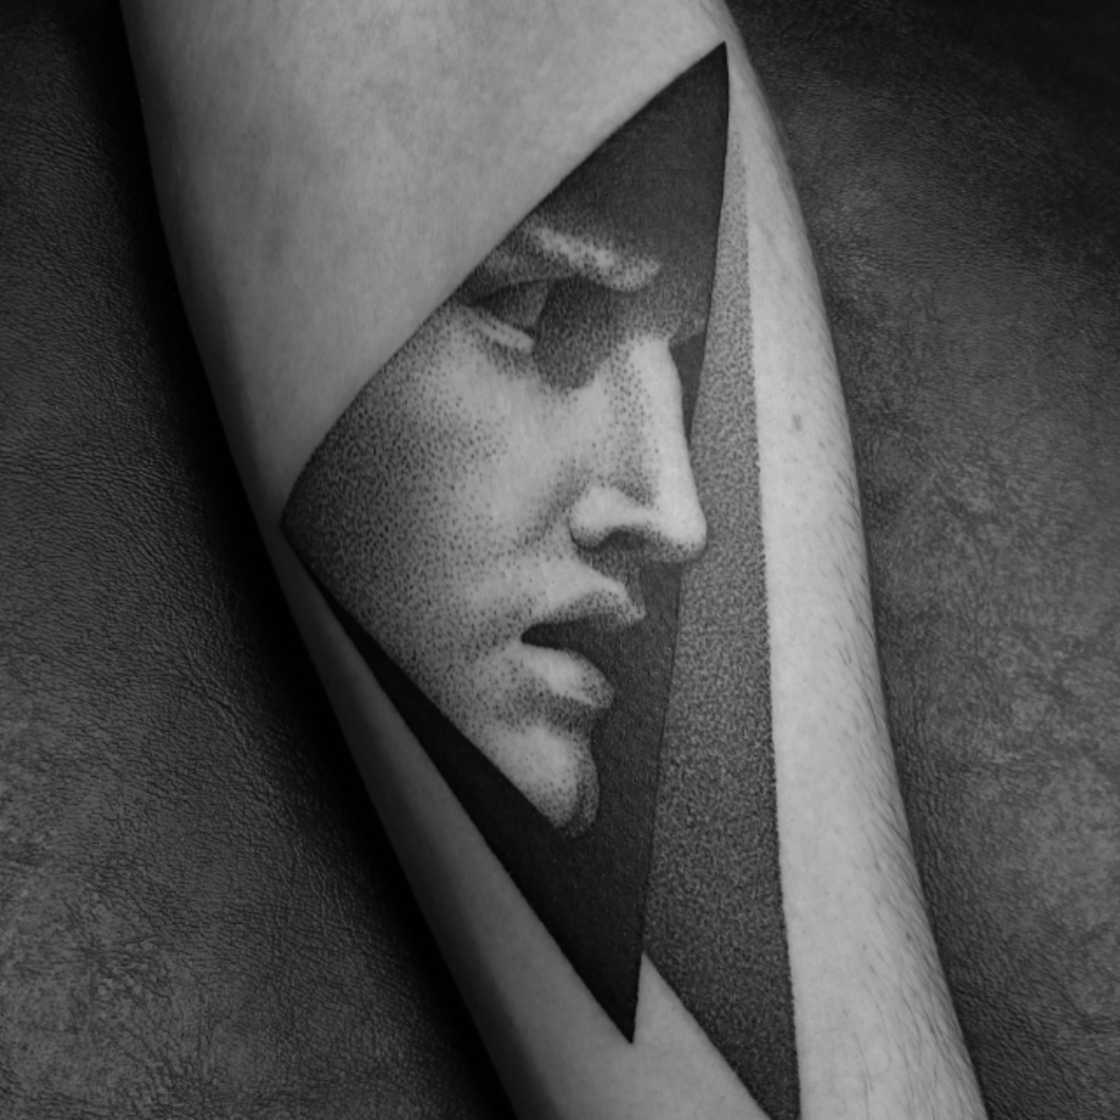 dotyk-dotwork-tattoo-13